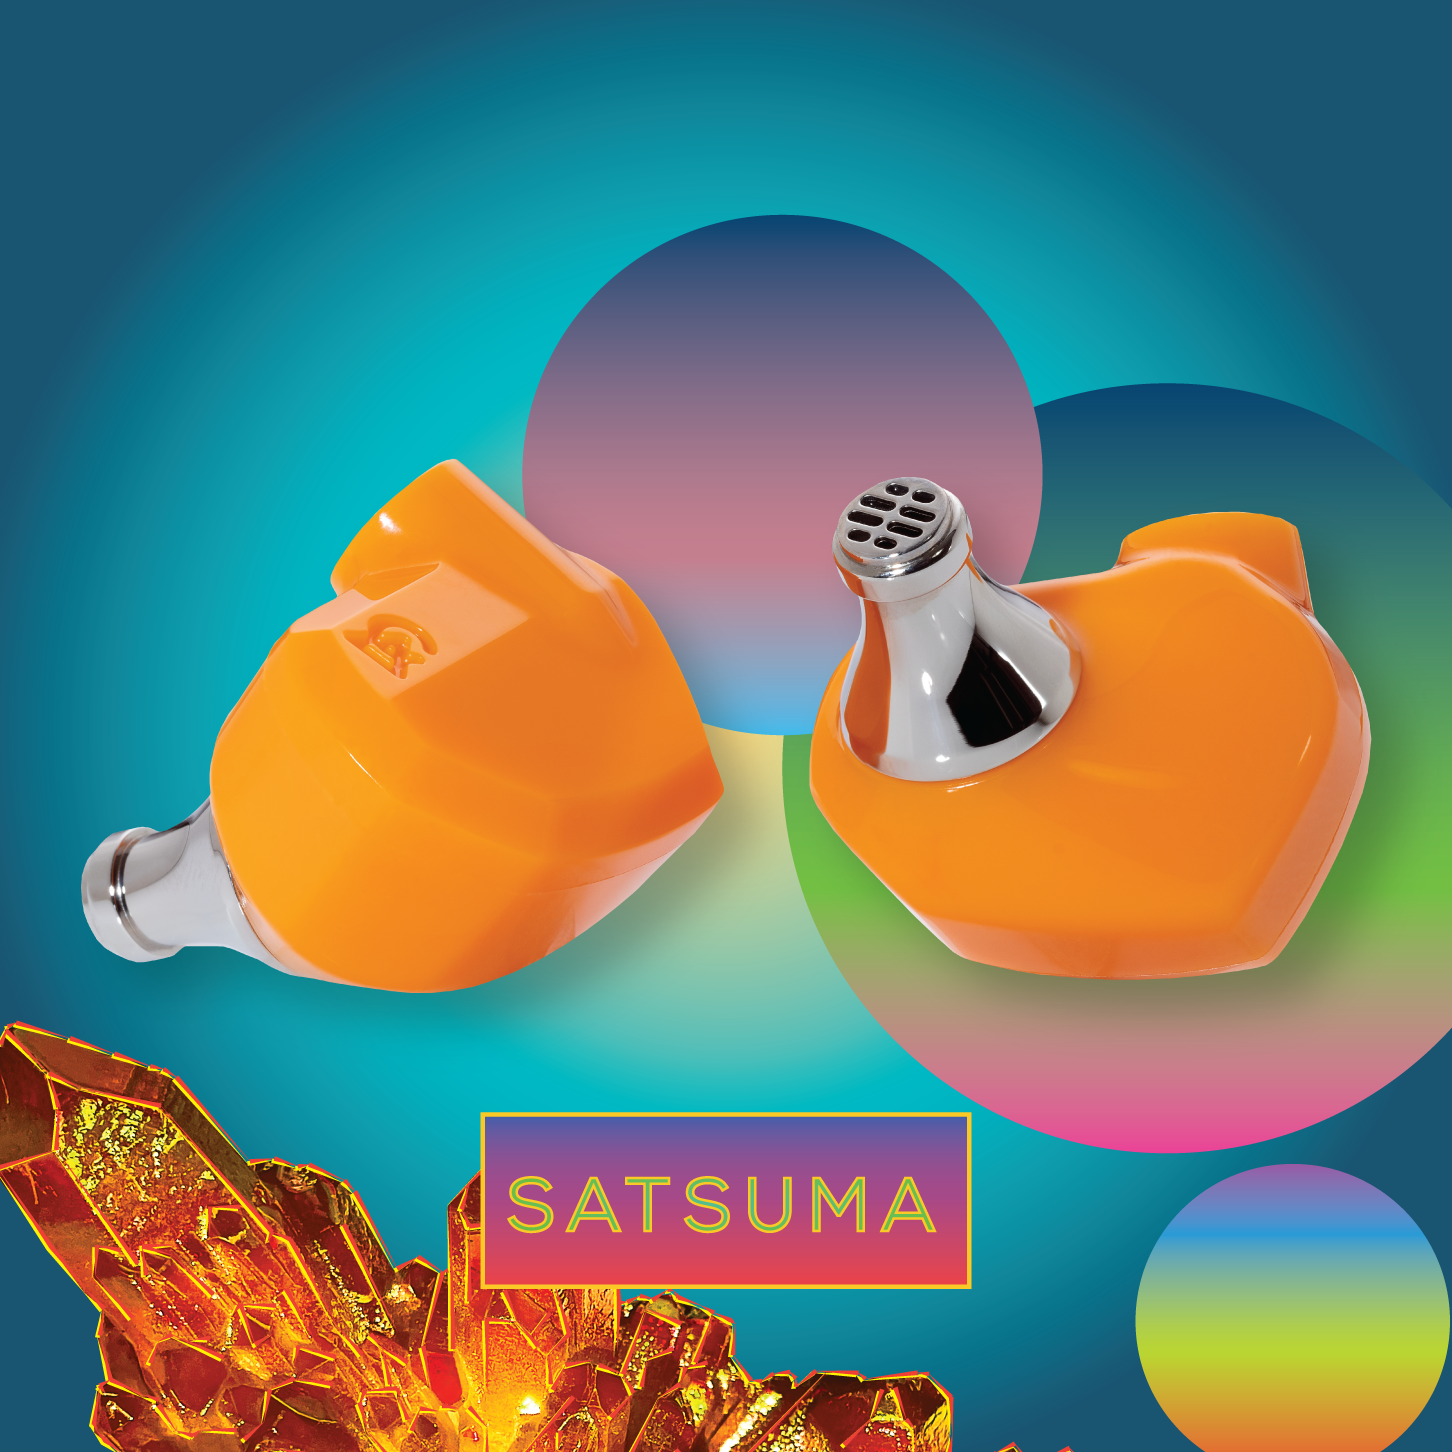 campfire audio satsuma iem over packaging imagery